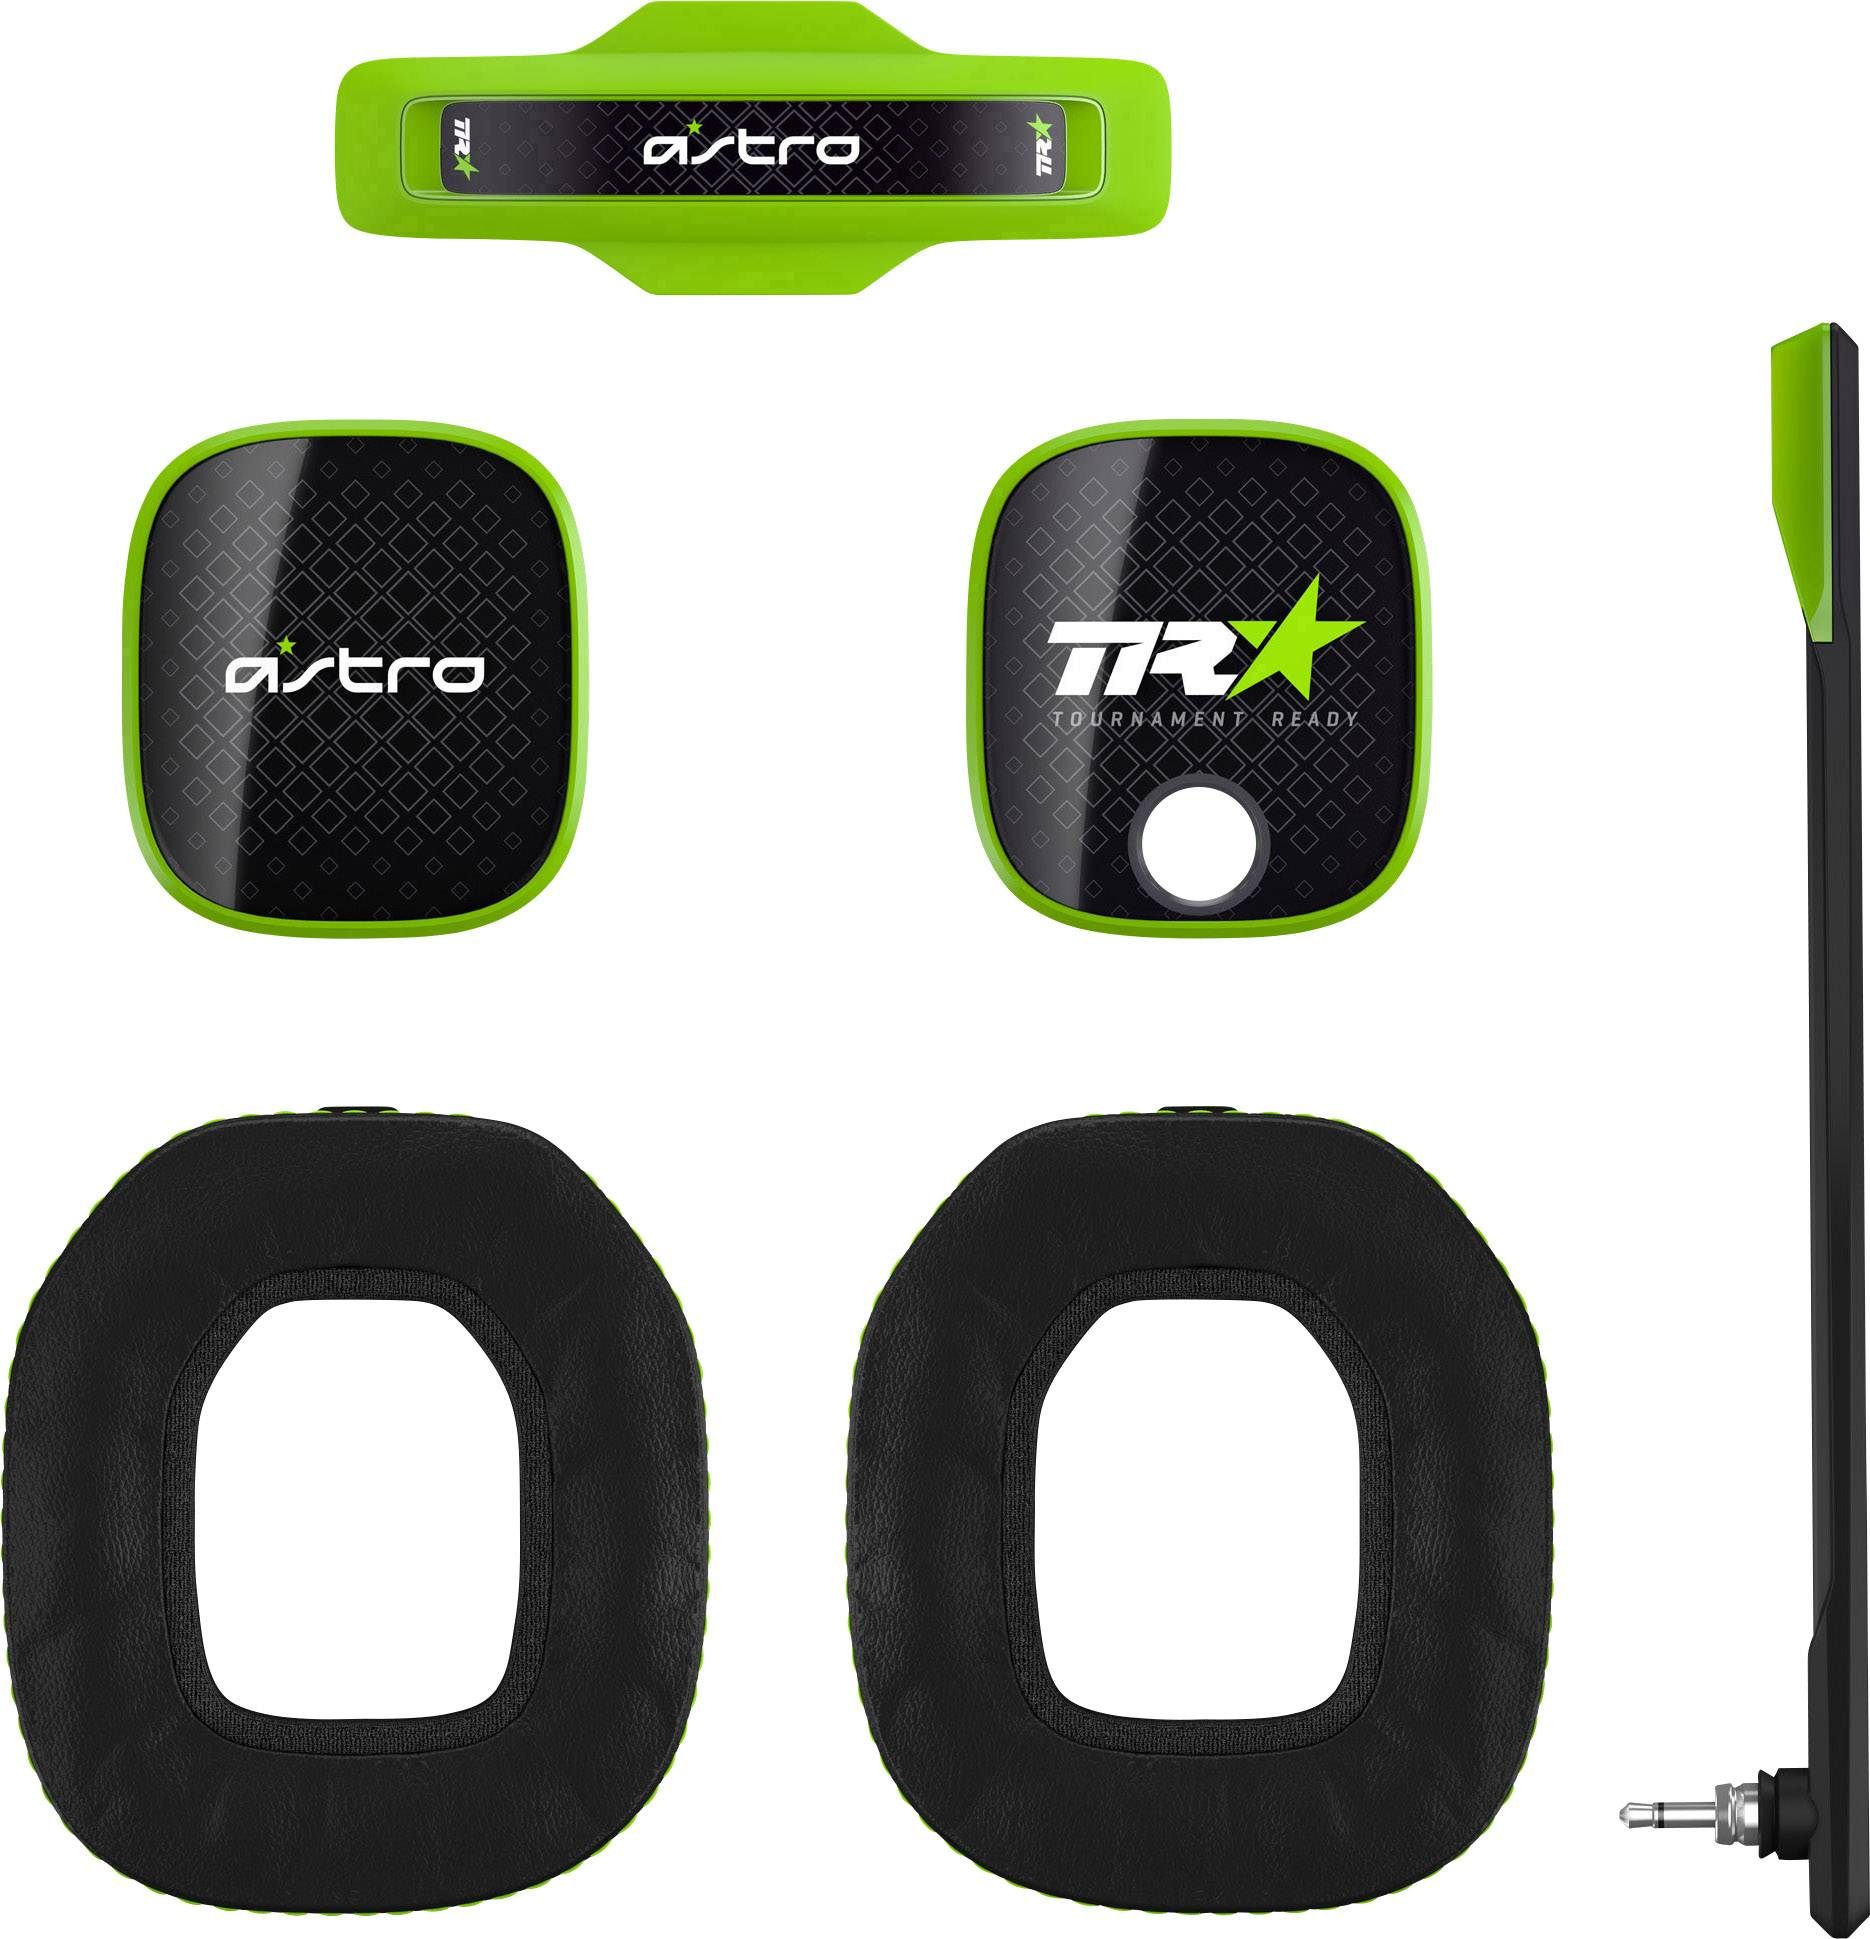 Astro A40TR Mod Kit Green Cuffia Headset per Gaming Mod Kit Verde, Nero